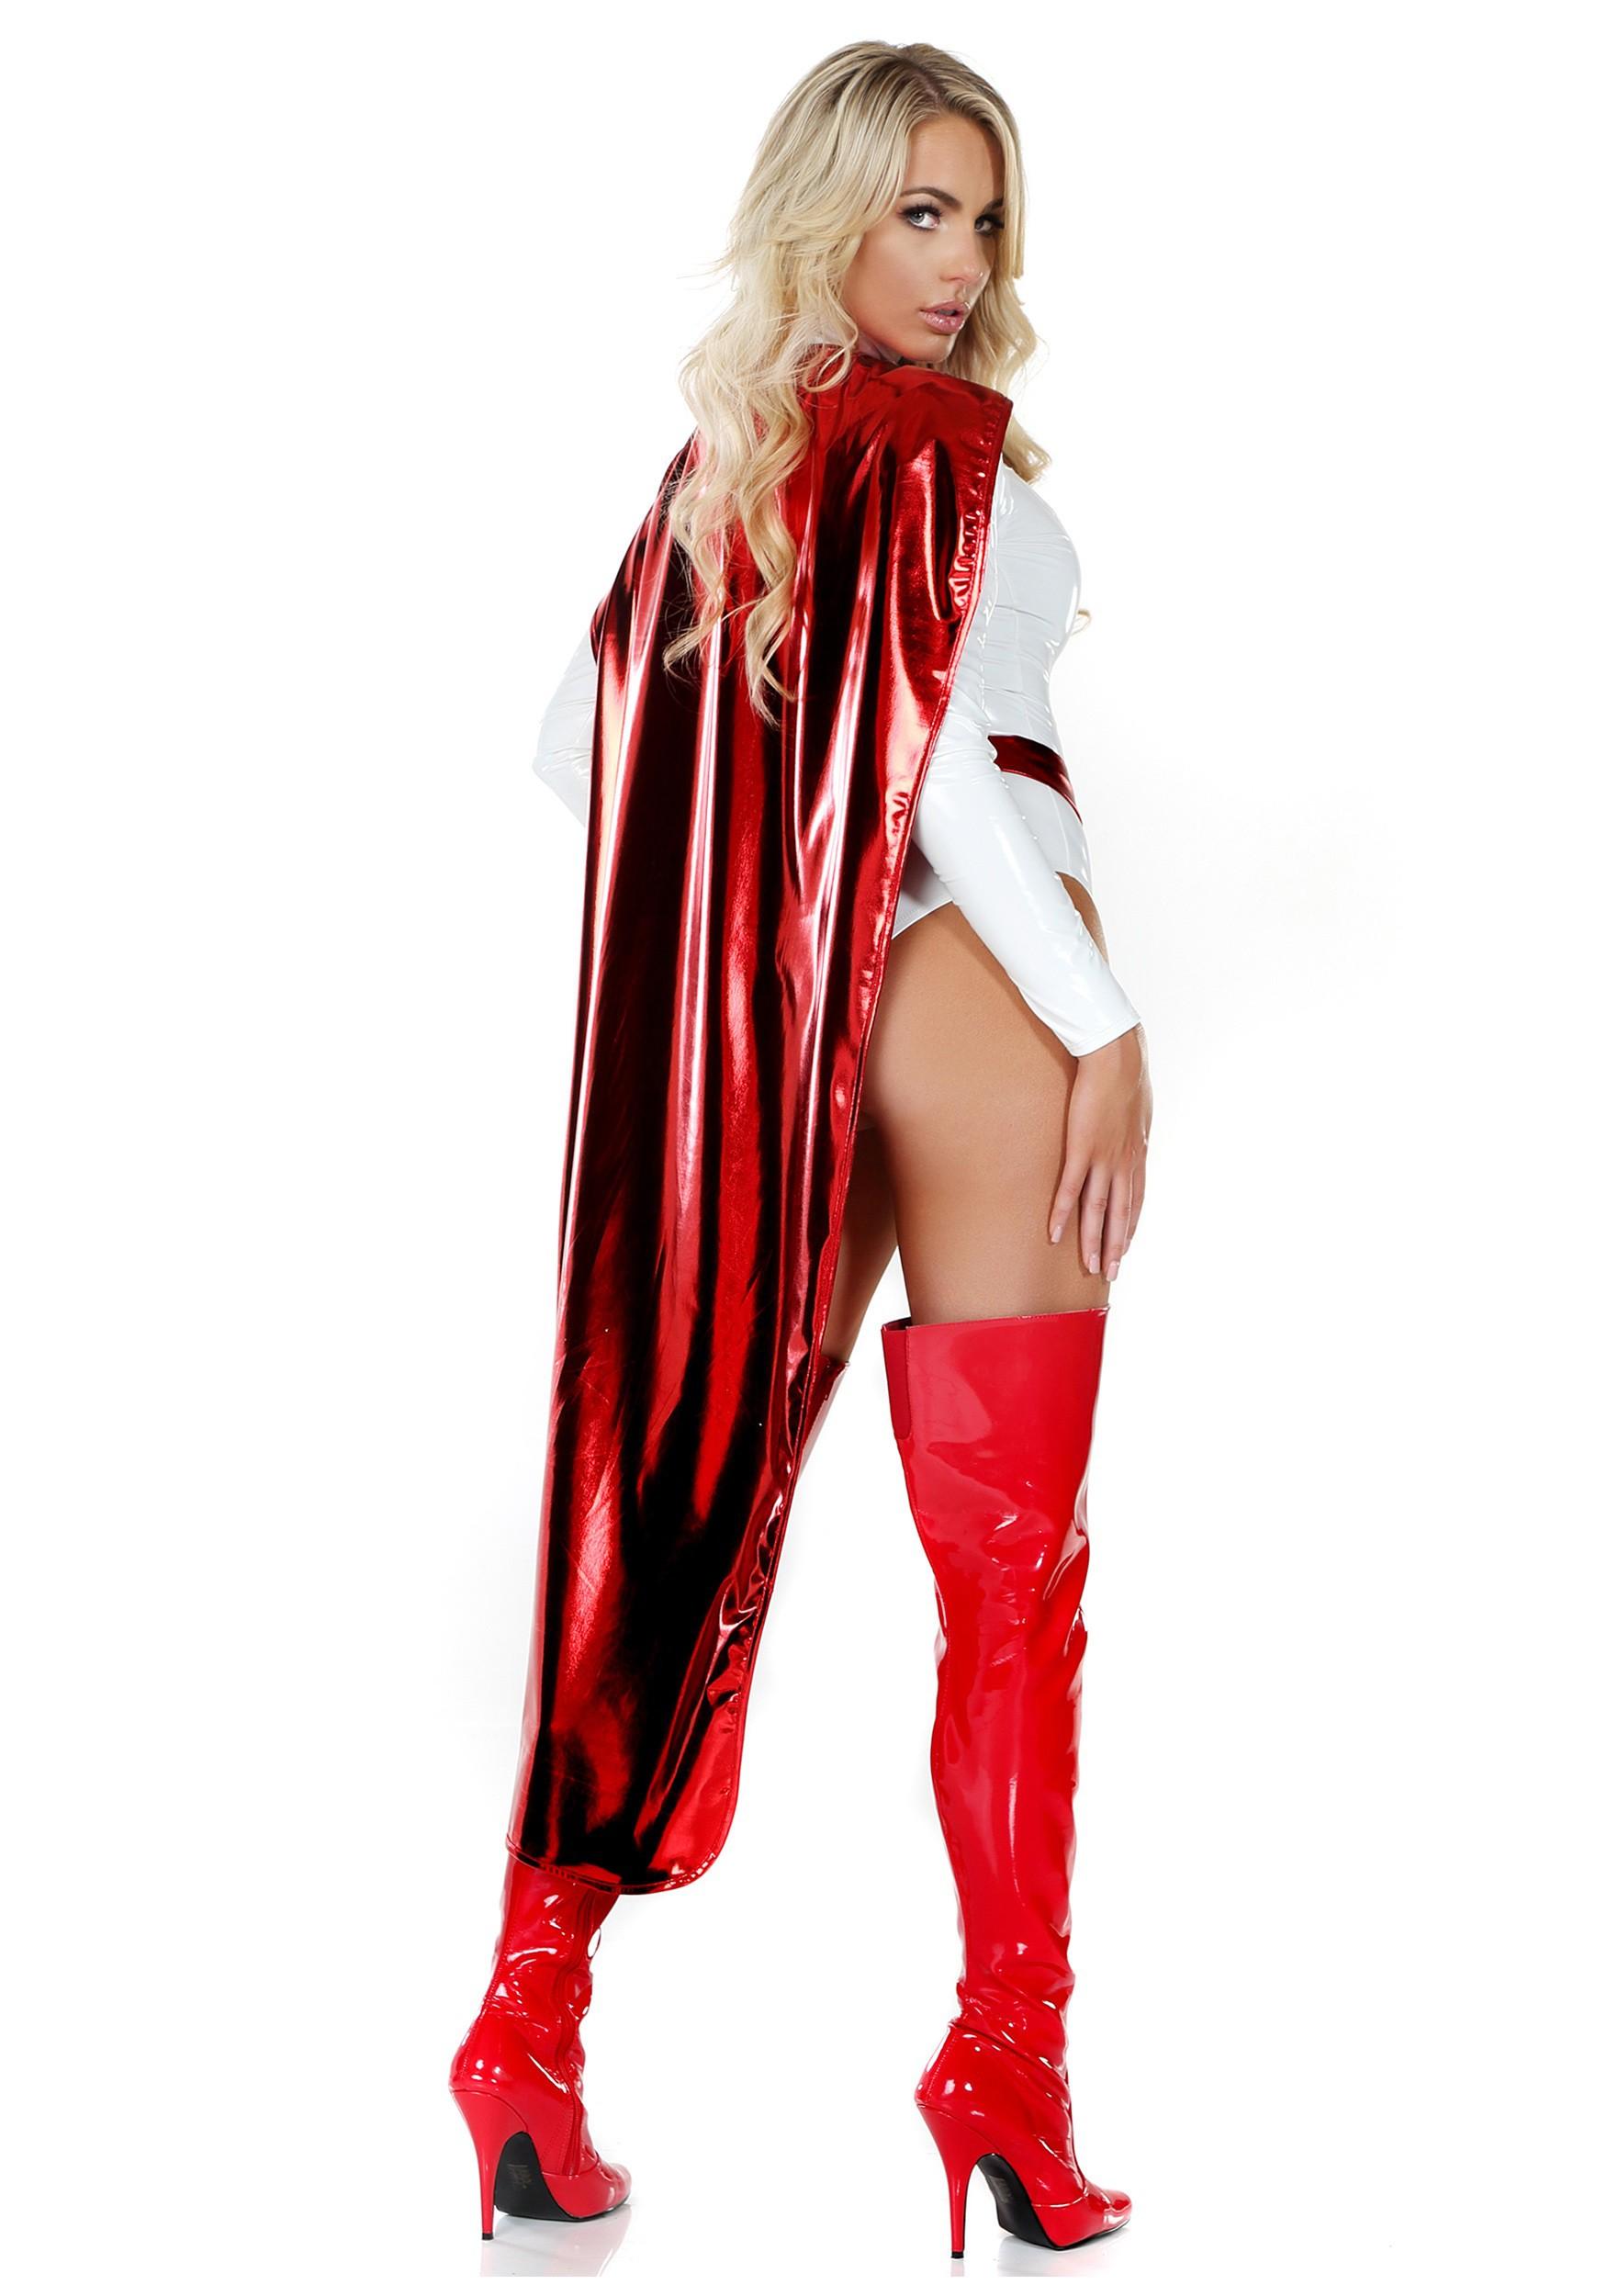 Http Www Halloweencostumes Com Deluxe Superhero Cape Html